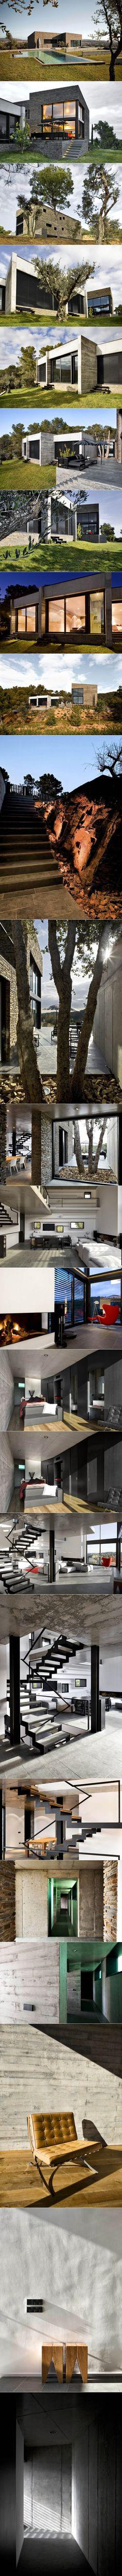 House on the Costa Brava - Journal of Design